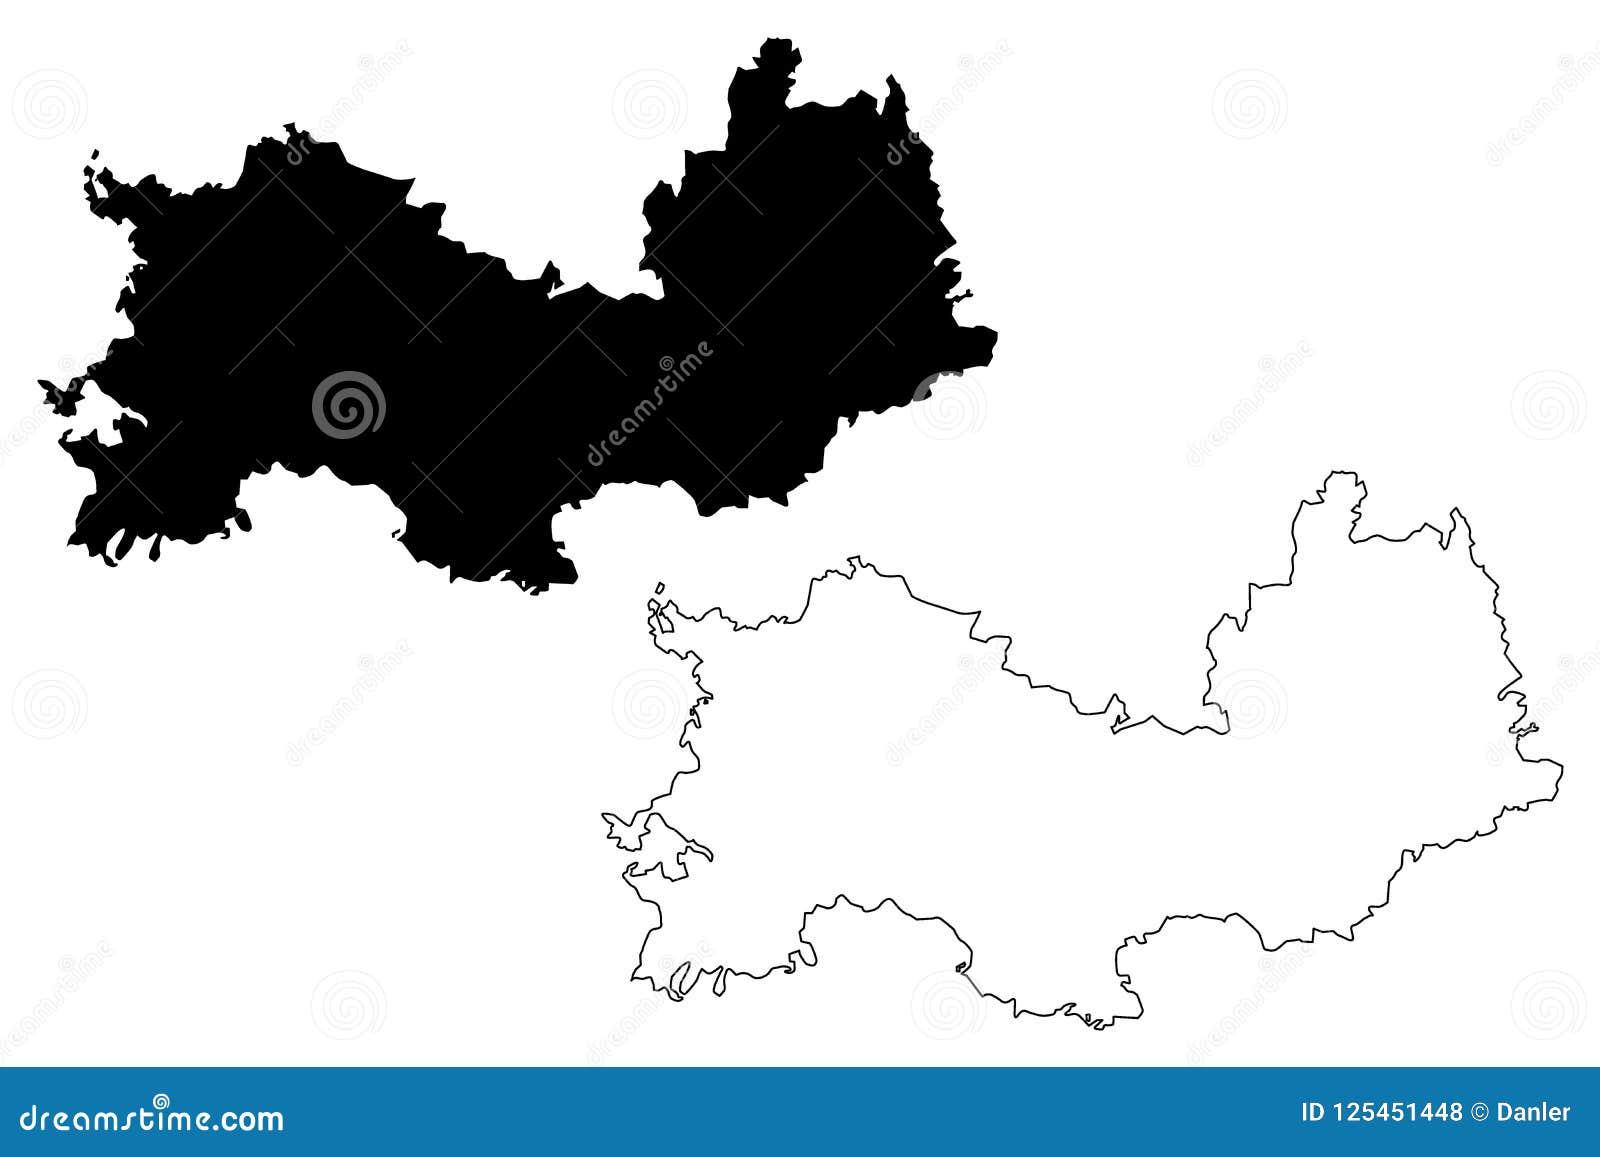 Mordovia map vector stock vector. Illustration of flat ... on flat united states map, flat eurasia map, flat great britain map, flat country map, flat europe map, flat us map, flat africa map, flat world maps,